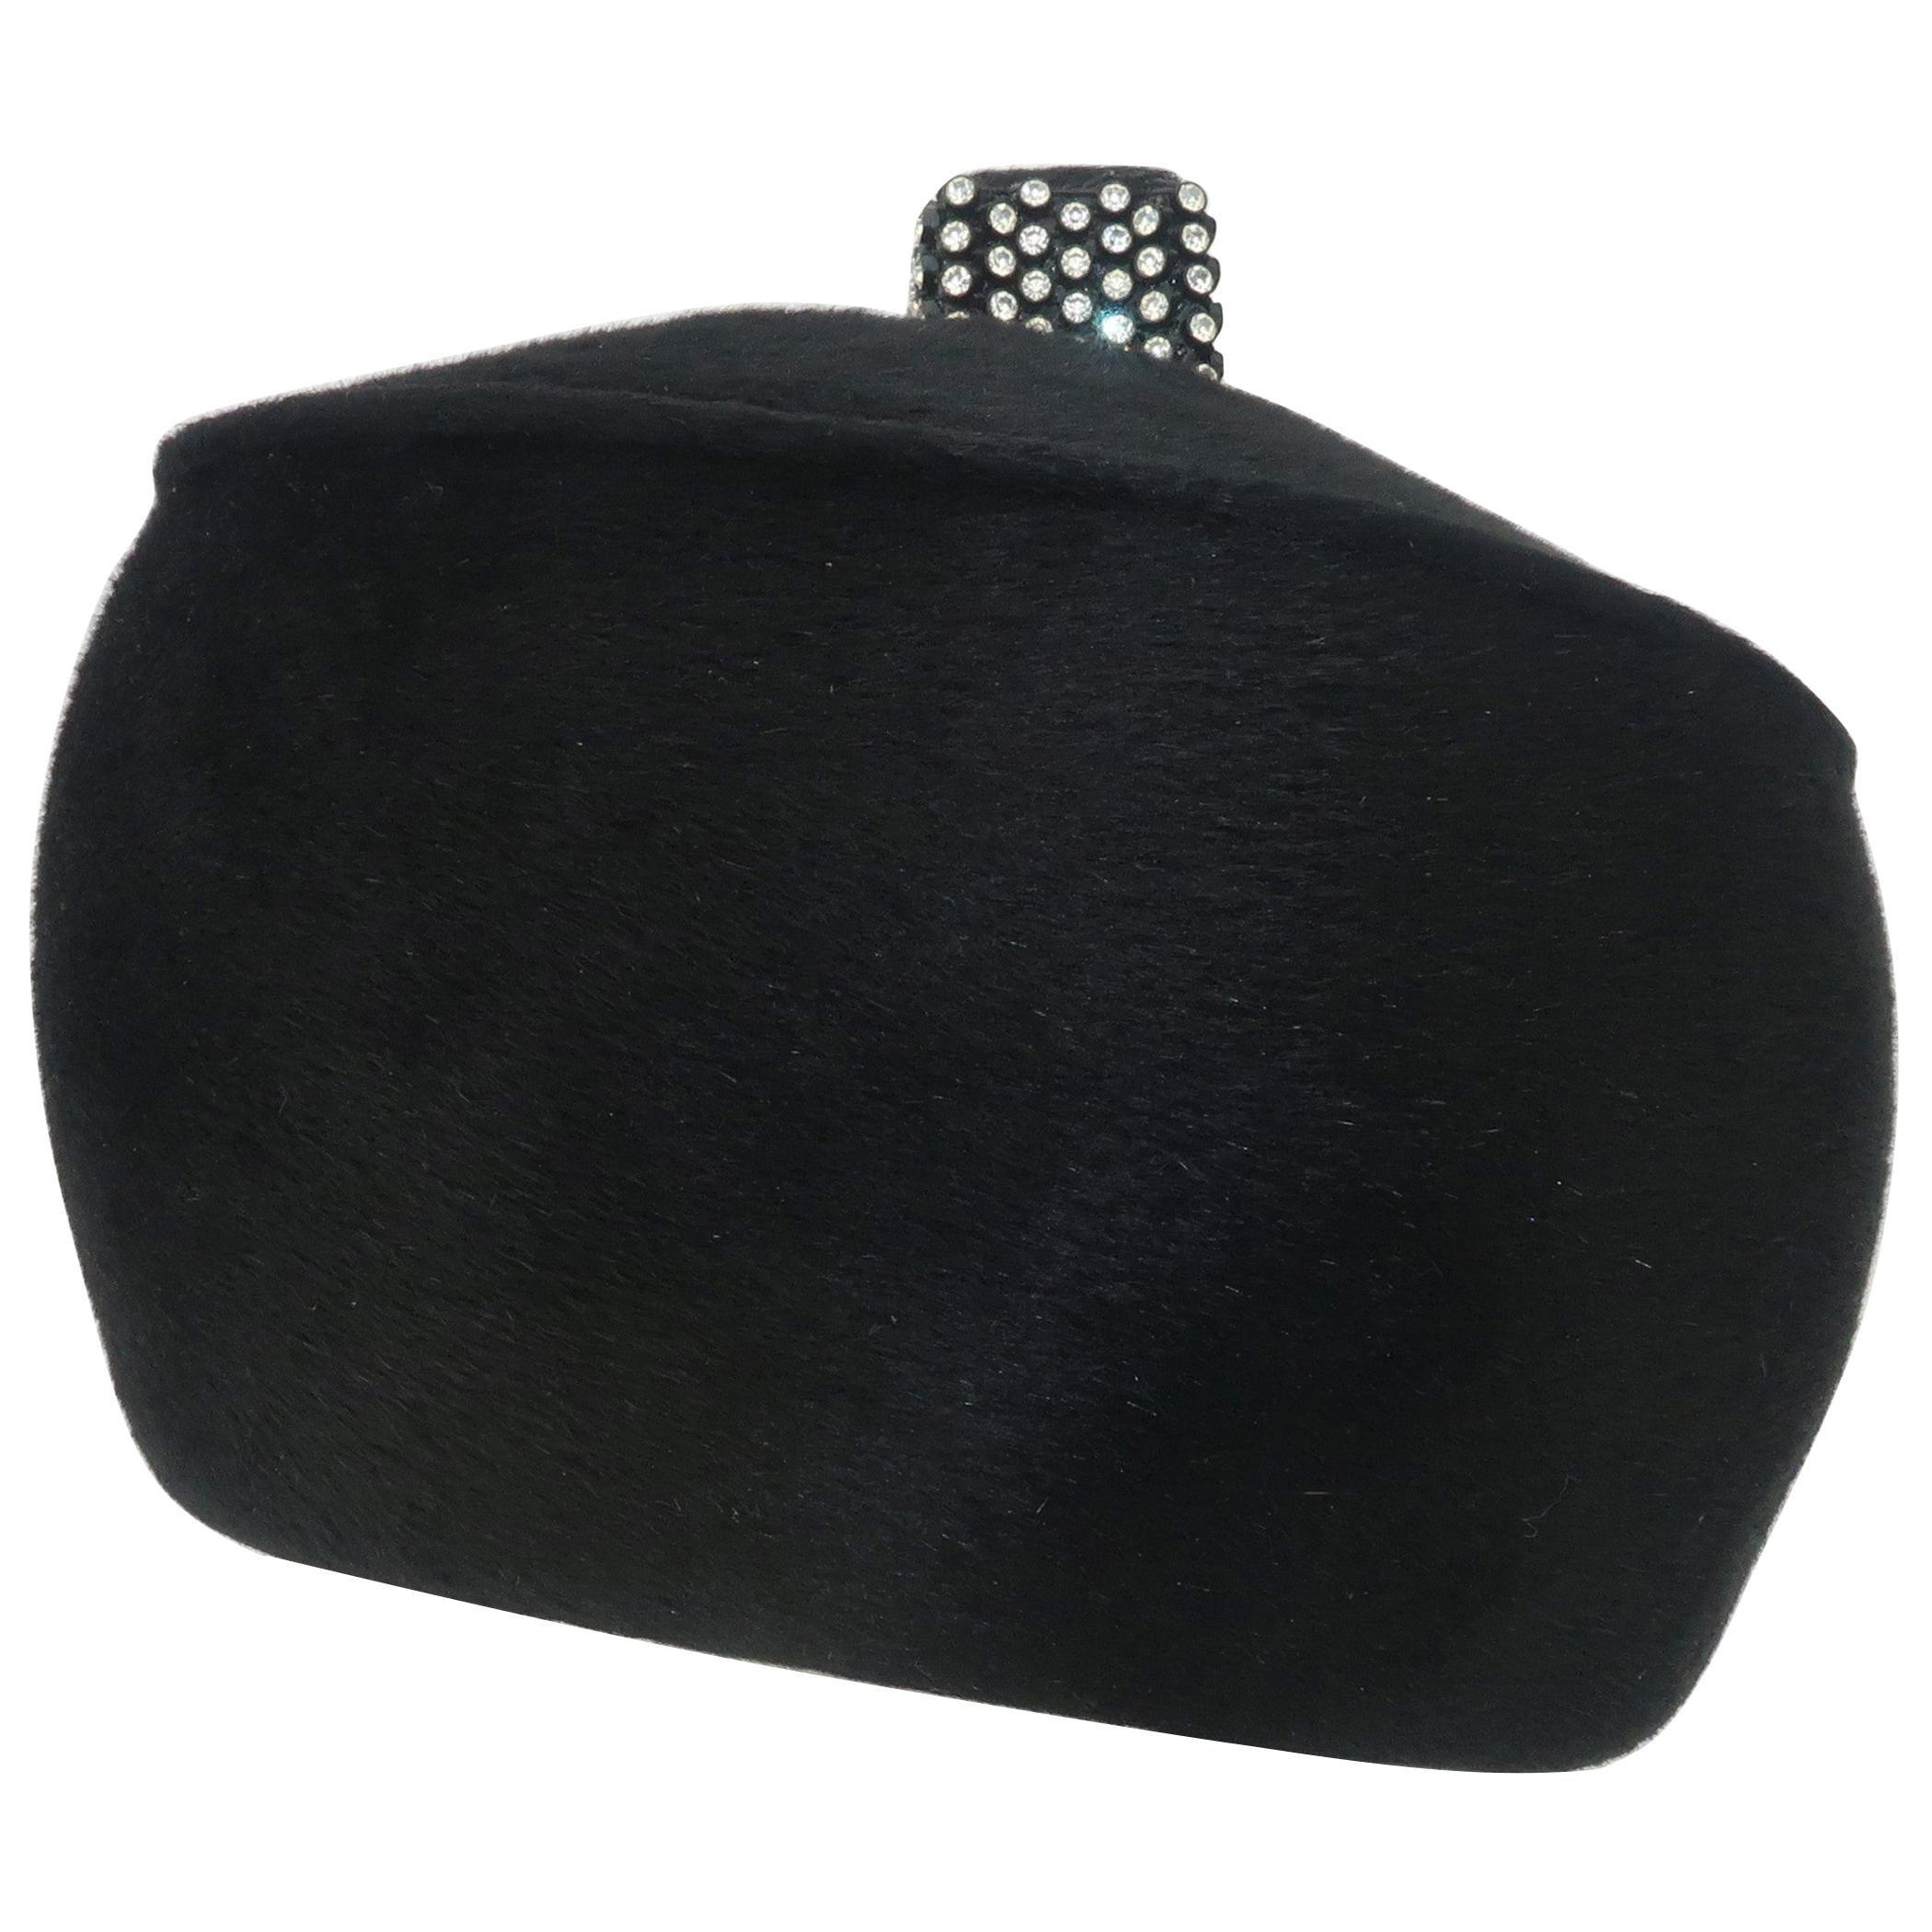 1960's Coralie Black Mohair & Rhinestone Toque Turban Style Hat